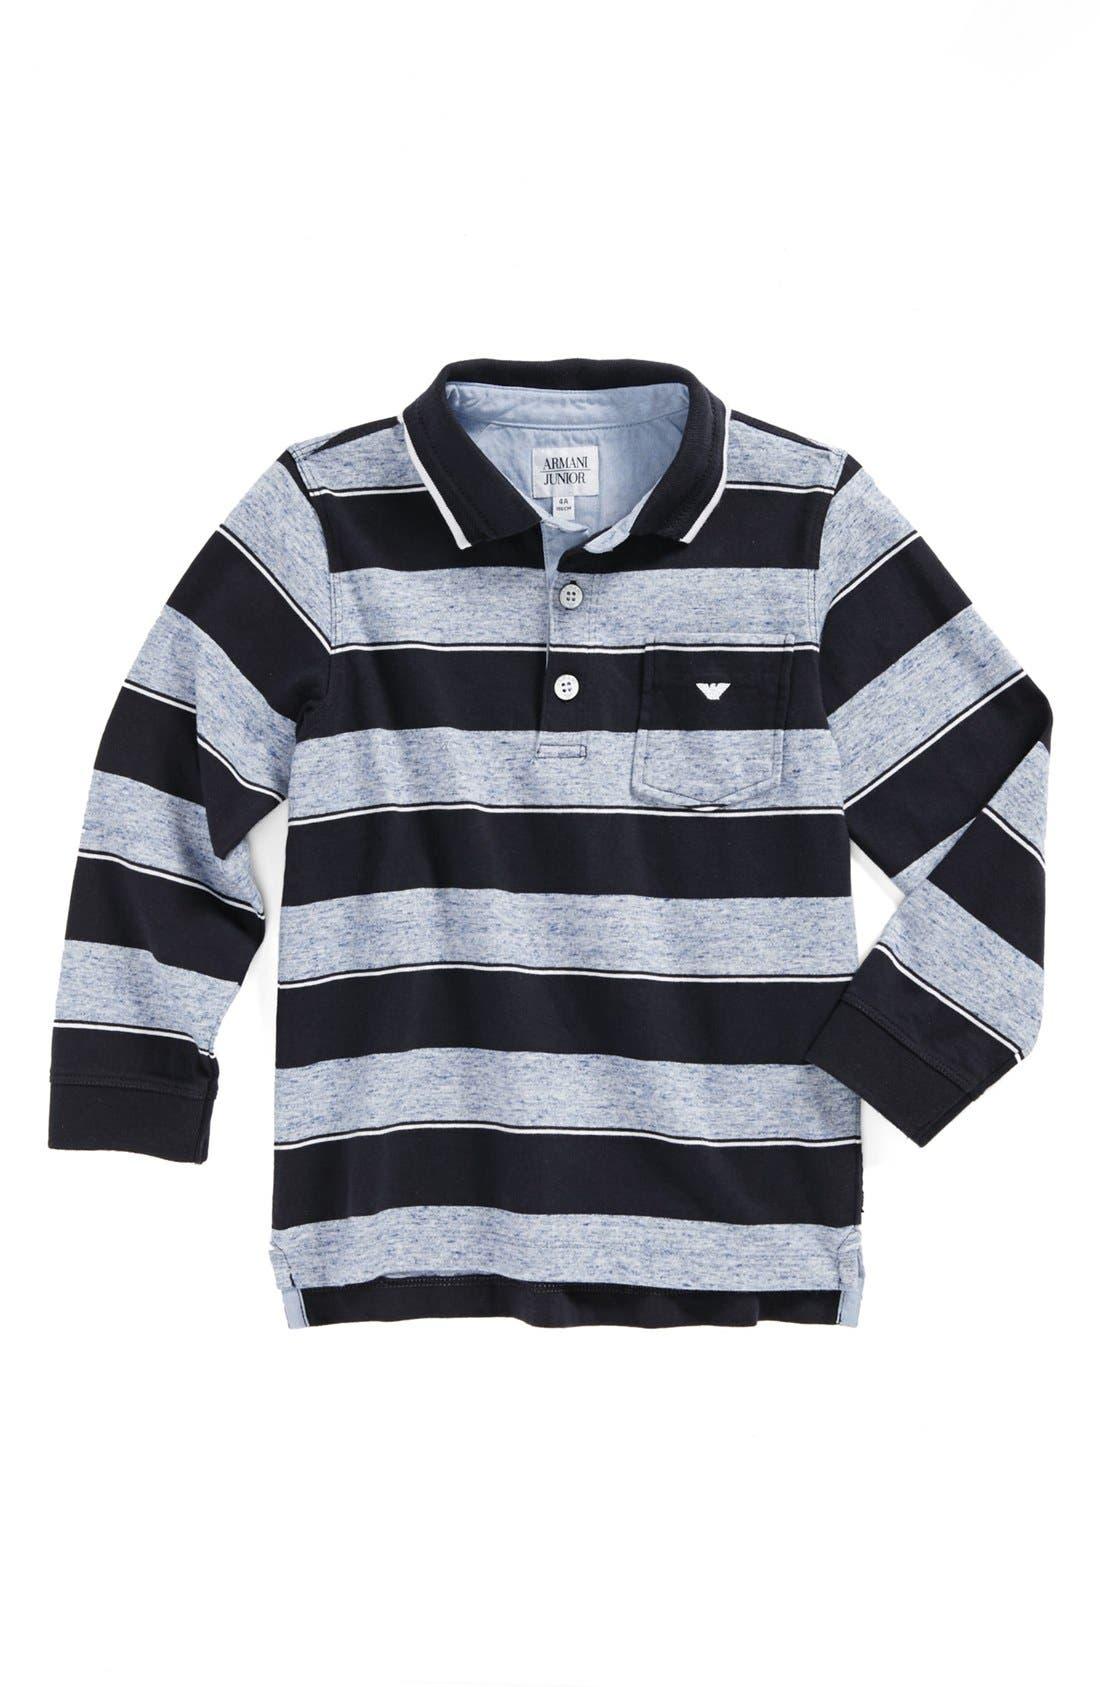 Alternate Image 1 Selected - Armani Junior Stripe Cotton Polo (Toddler Boys)